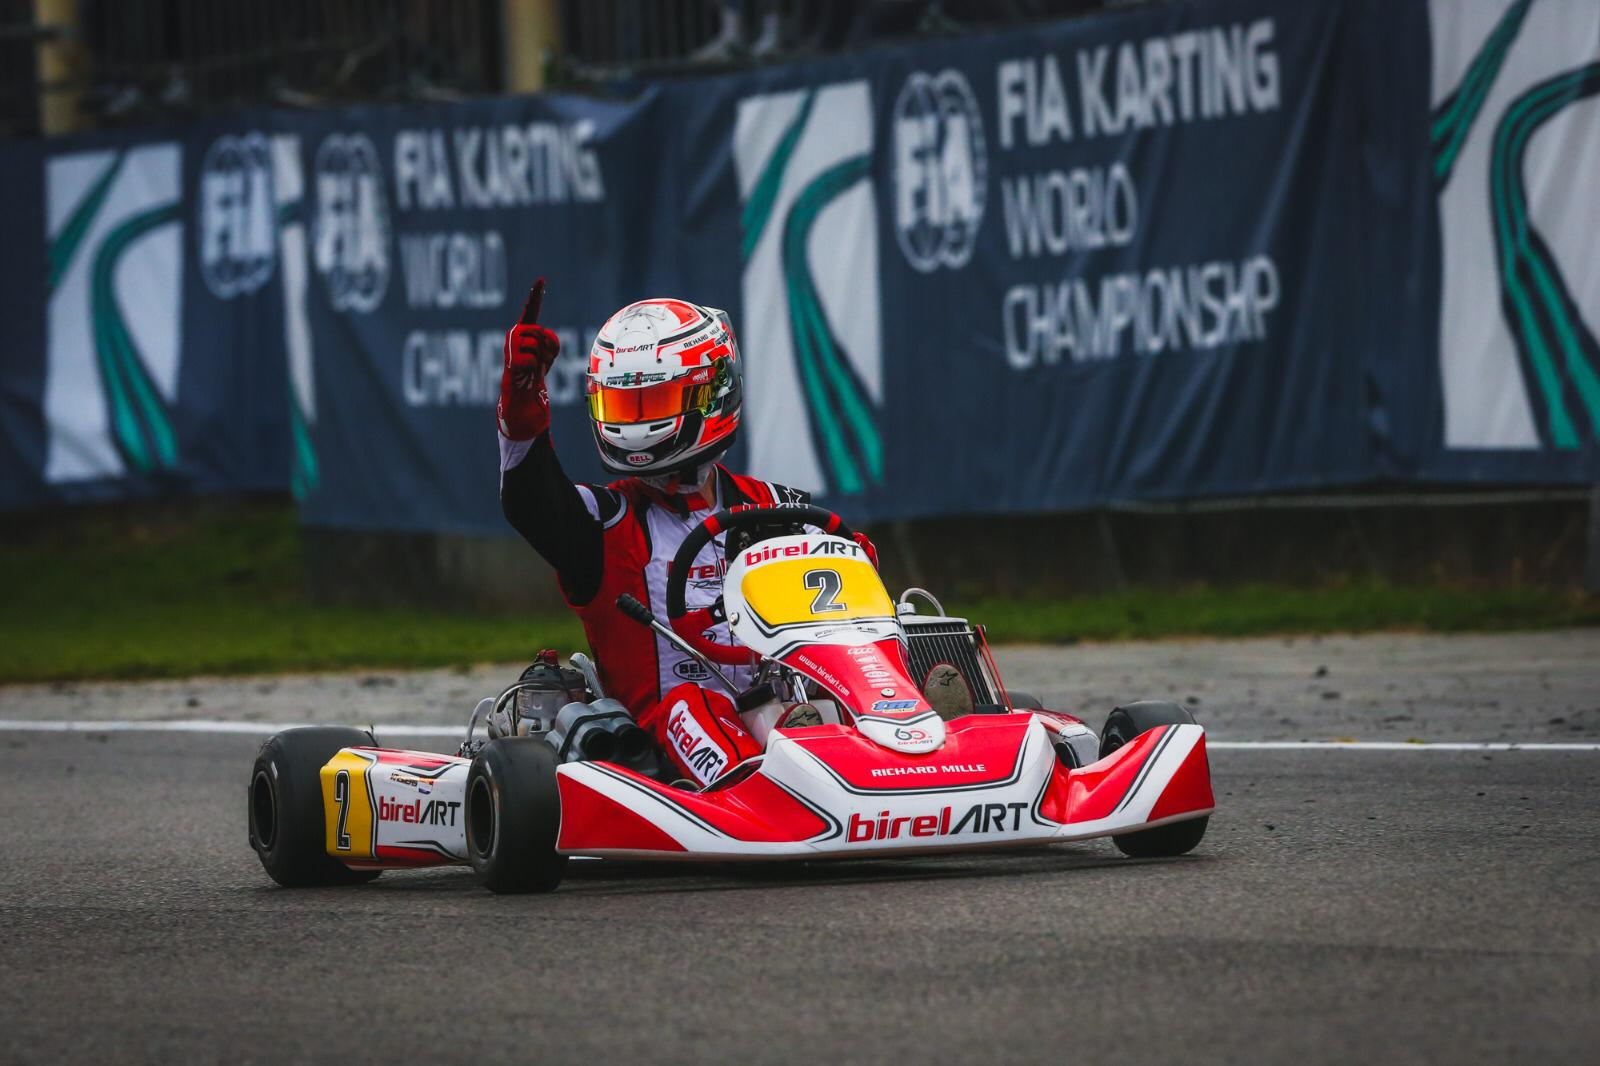 FIA World, Lonato: Kremers (KZ), Denner (KZ2) and Siksnelis (Academy) the new Champions